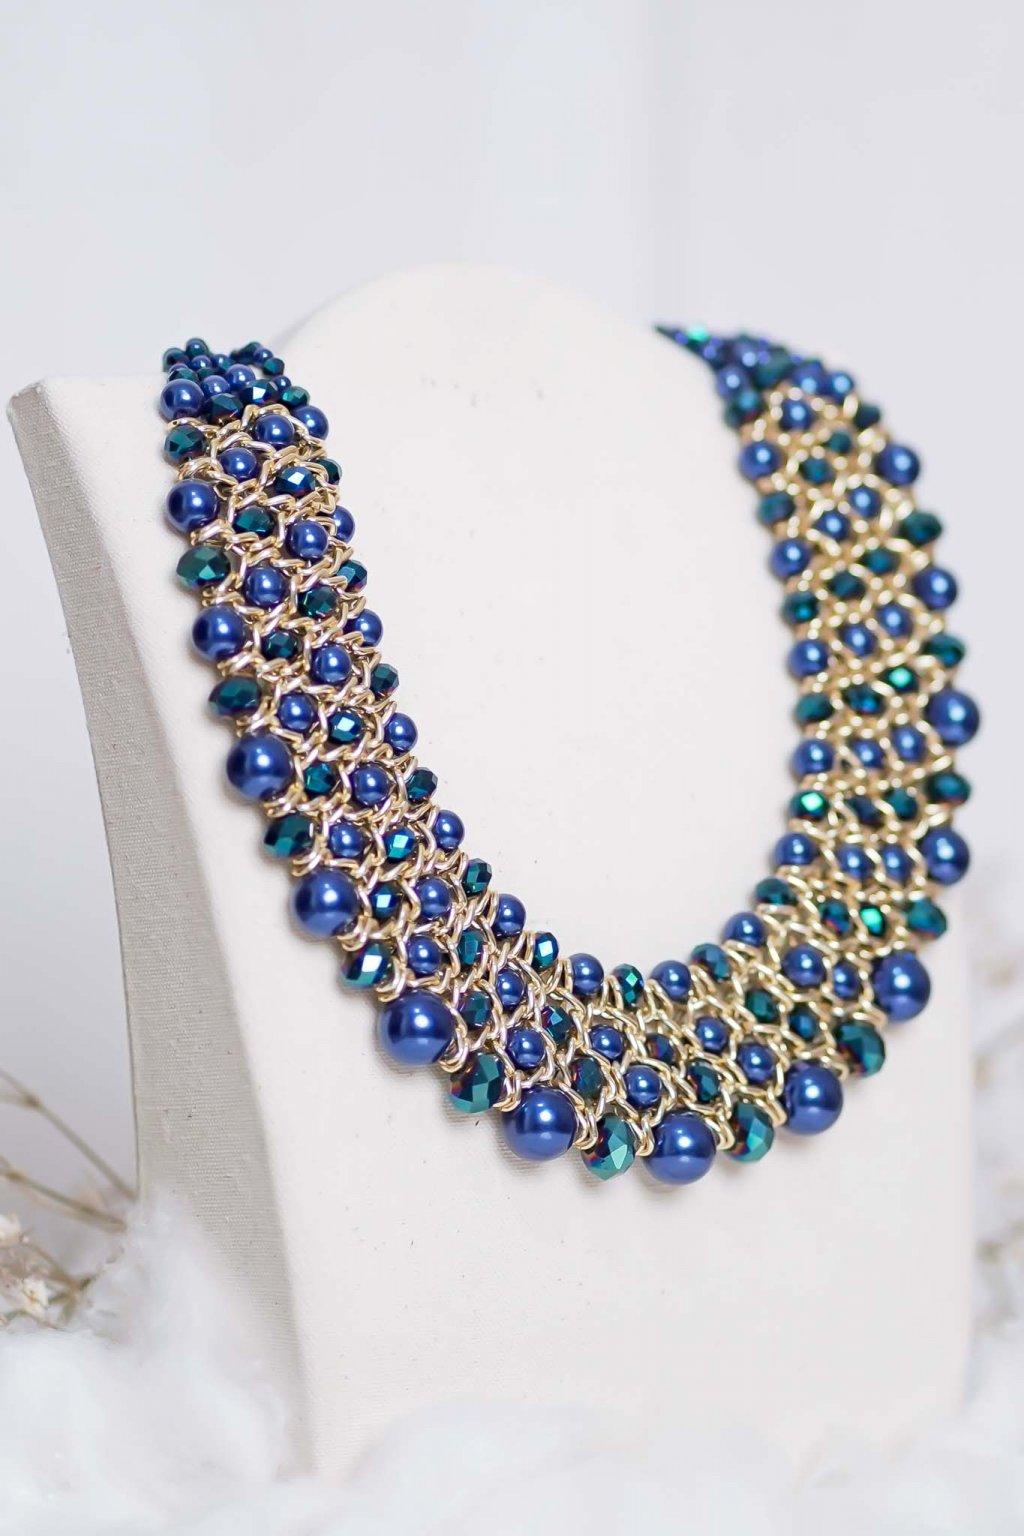 náhrdelník, šperk, spoločenská náhrdelník, náhrdelník na bežný deň, výrazný náhrdelník, jemný náhrdelník, šperky, náhrdelník na ples, svadbu, stužkovú 65